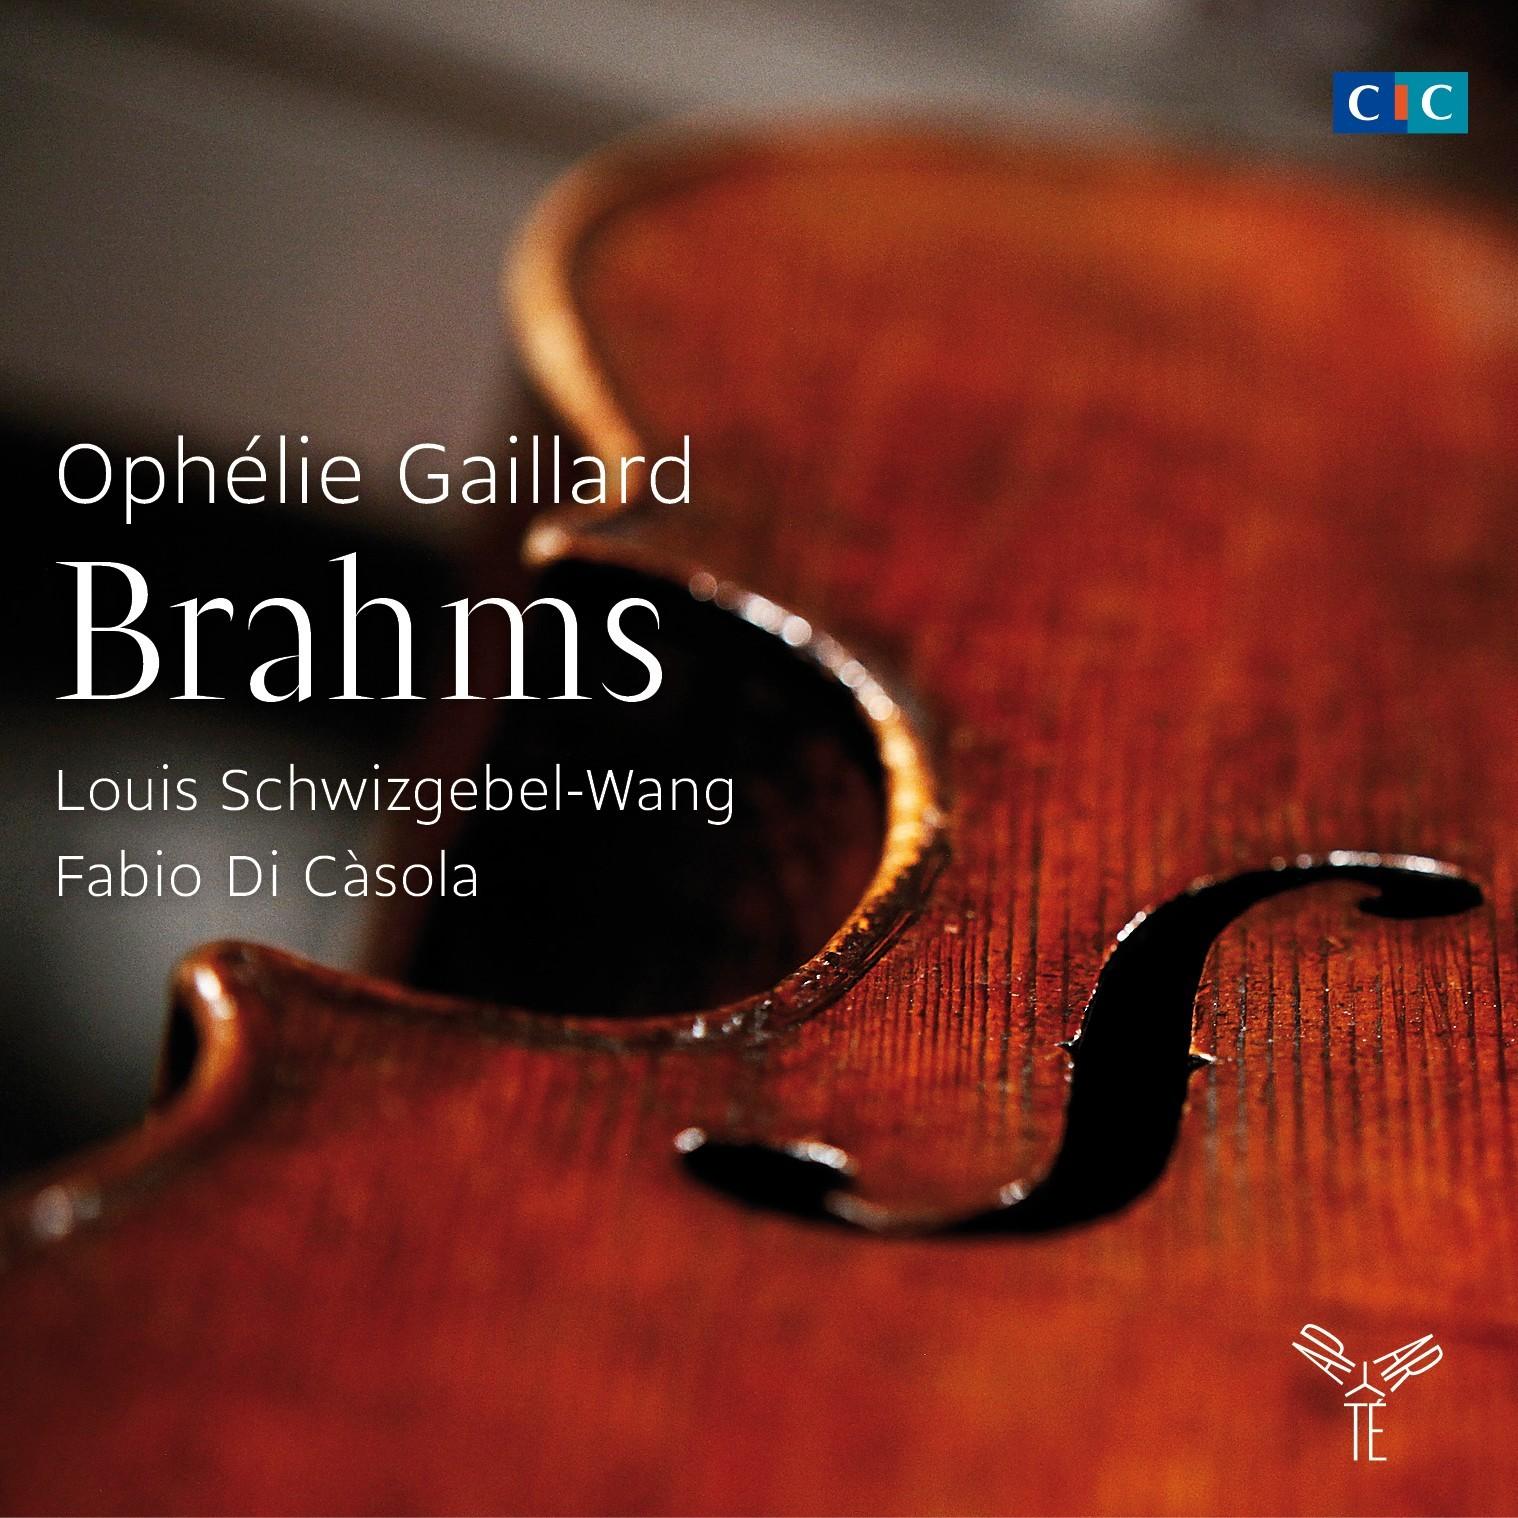 Ophélie Gaillard: Brahms